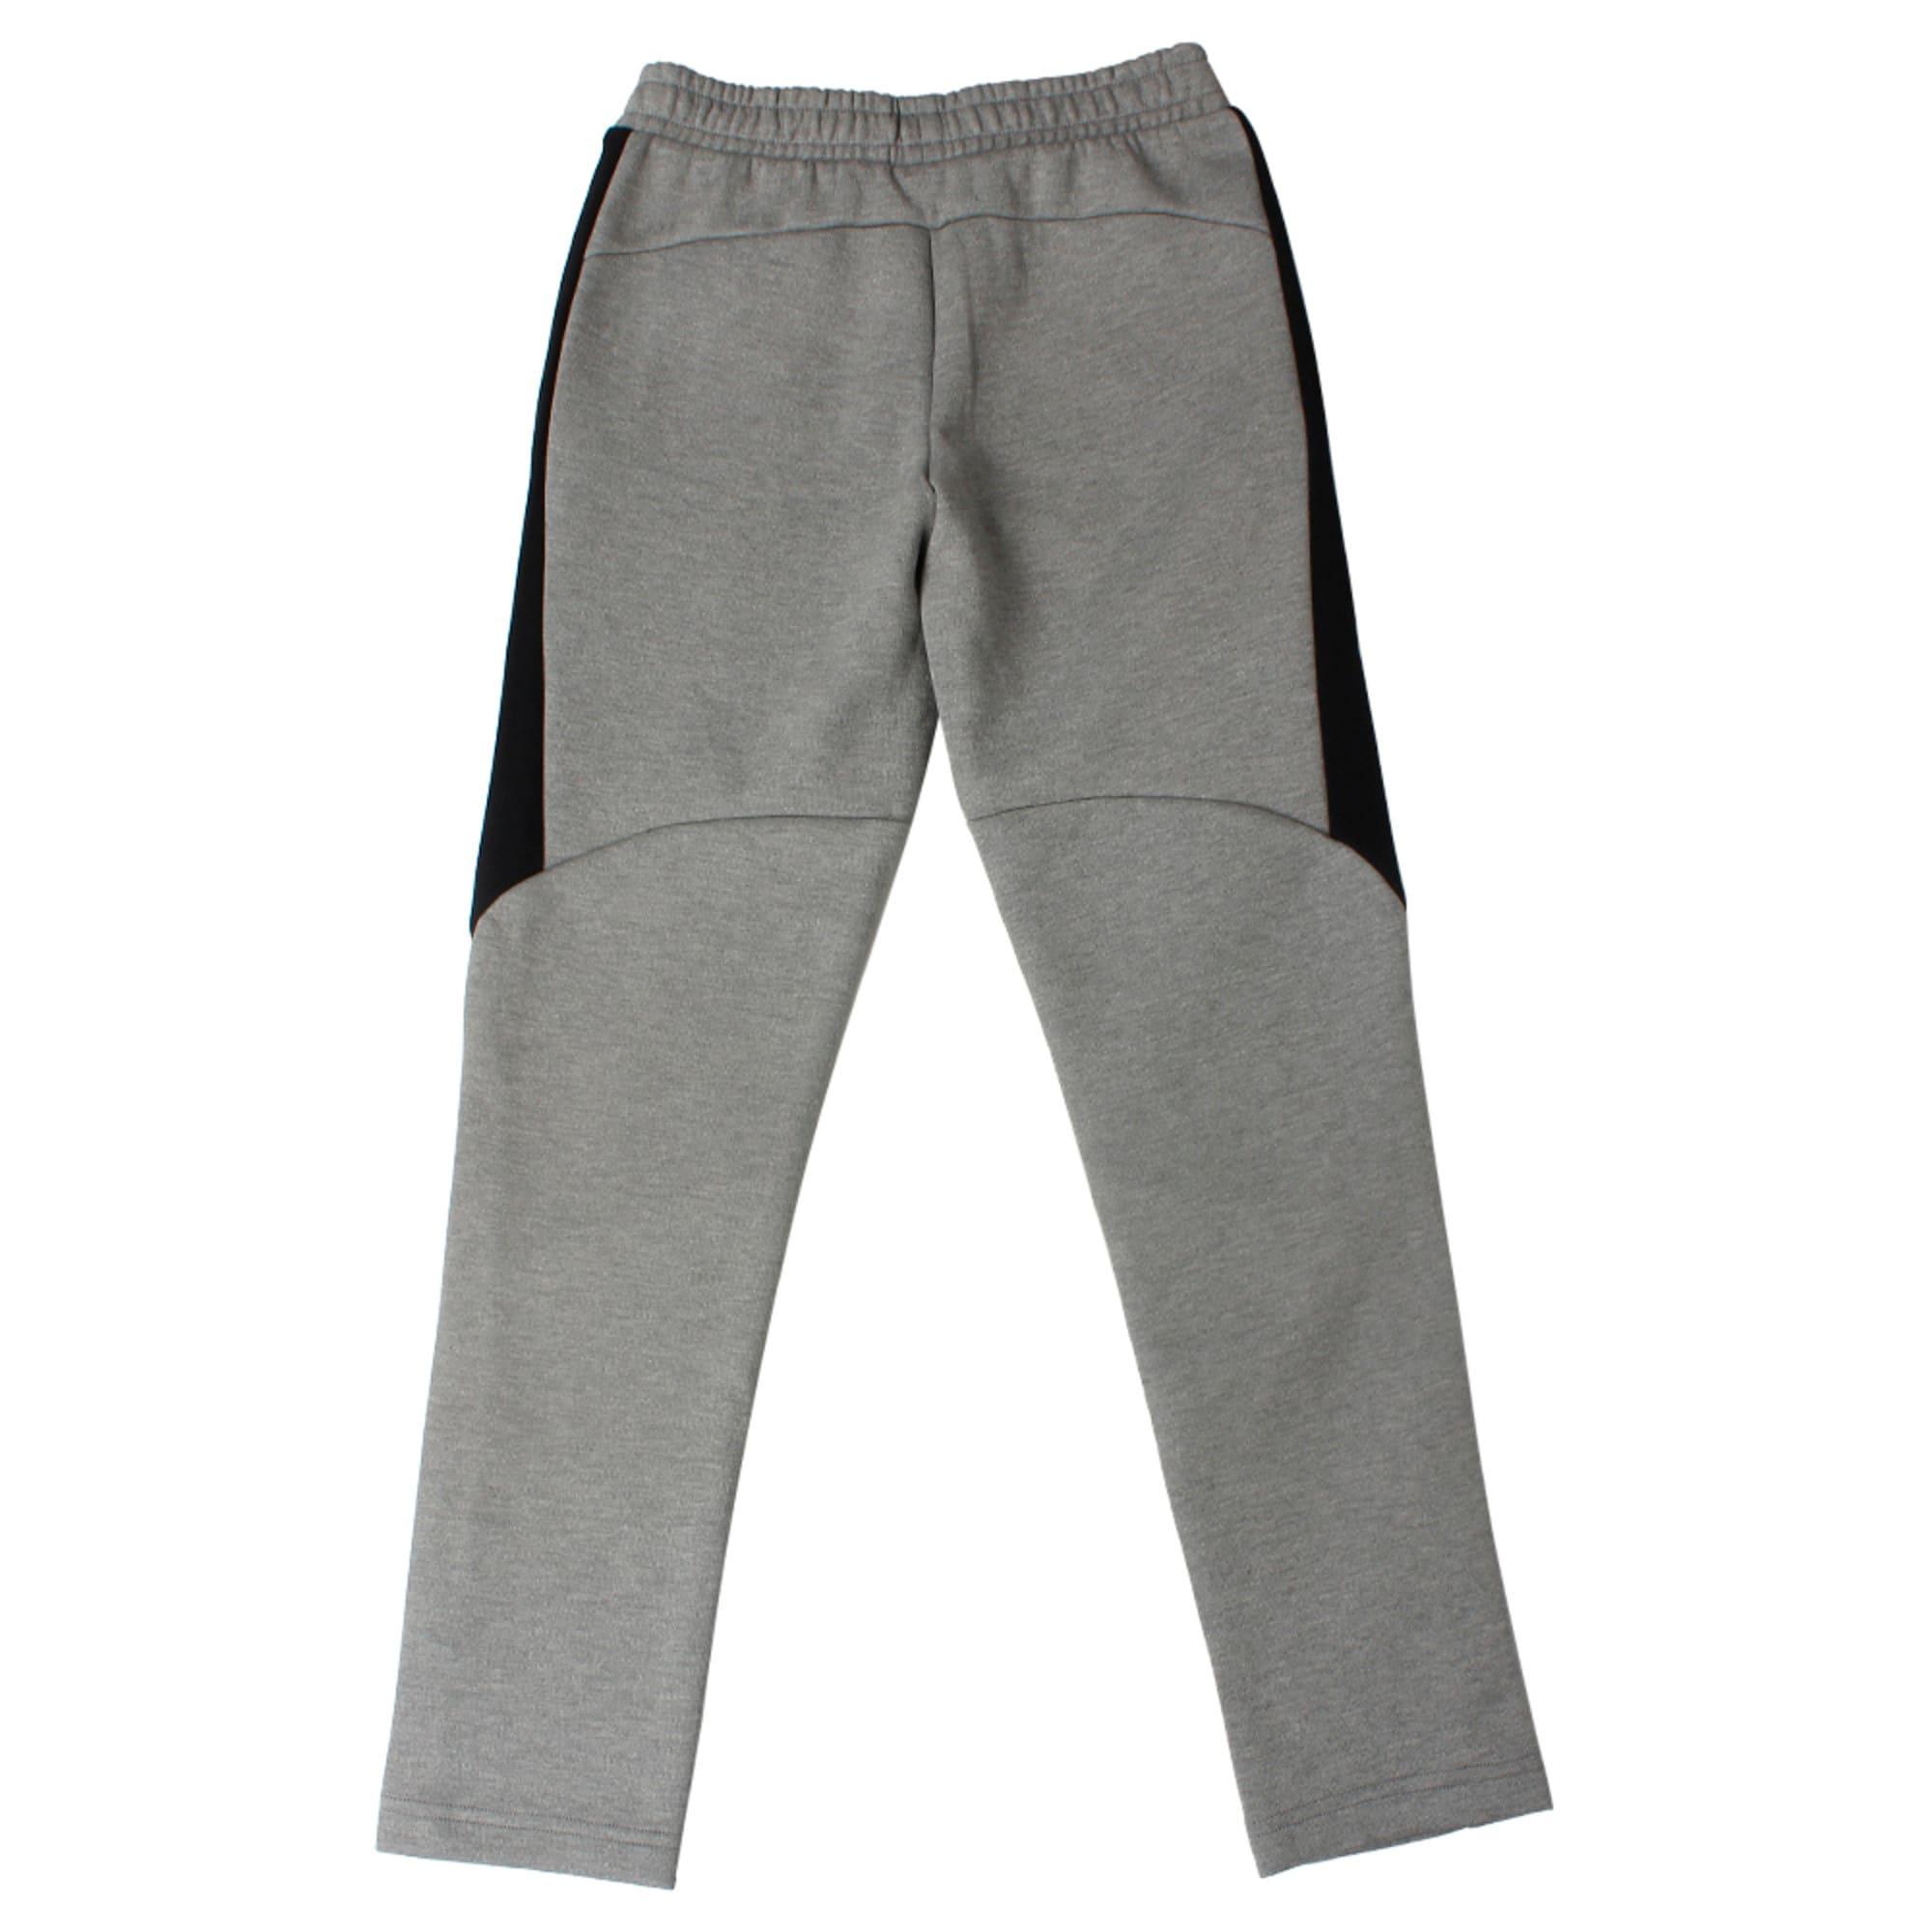 Thumbnail 2 of Evostripe Move Boys' Pants, Medium Gray Heather, medium-IND